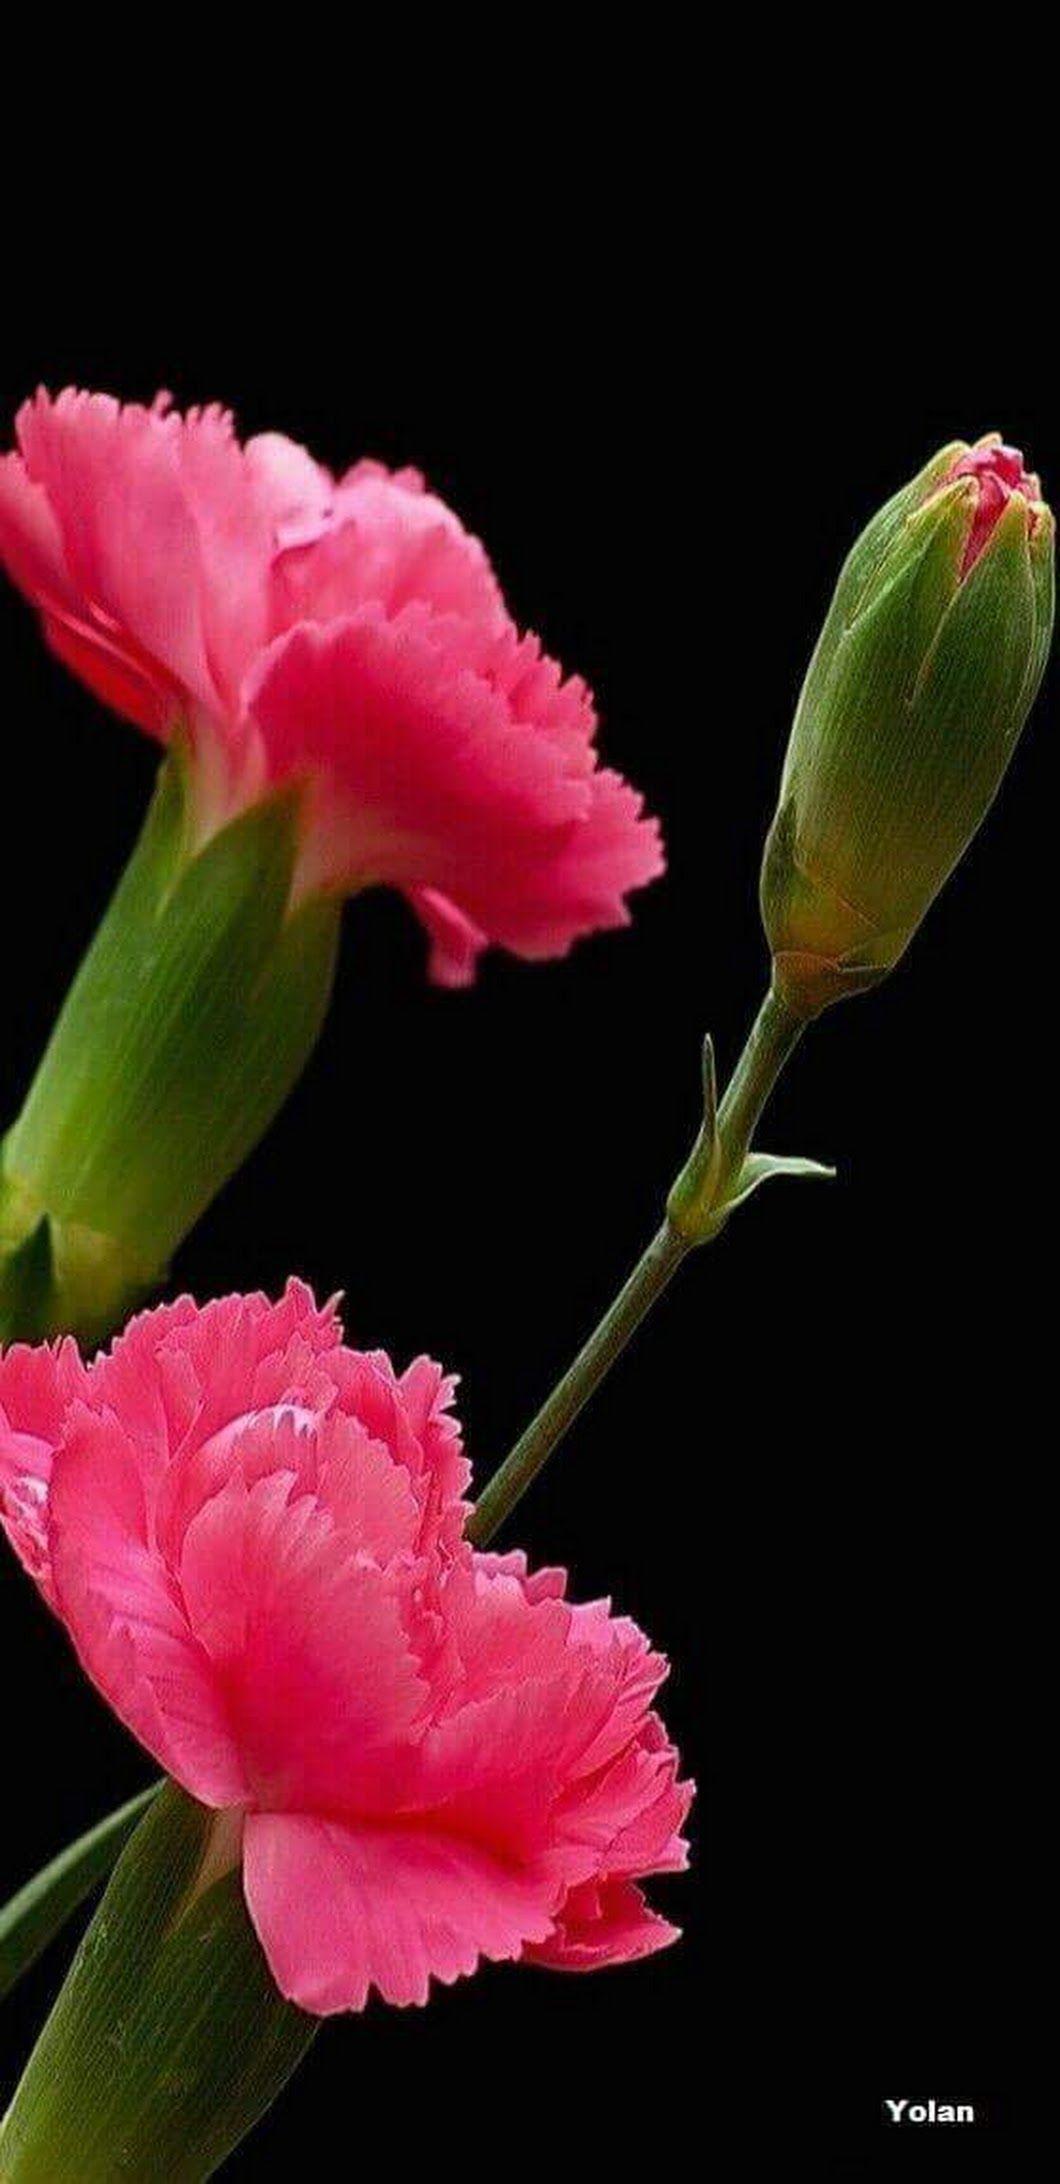 Pin By Rin Kymo On Theme Nature Pinterest Fleurs Fleur Jardin